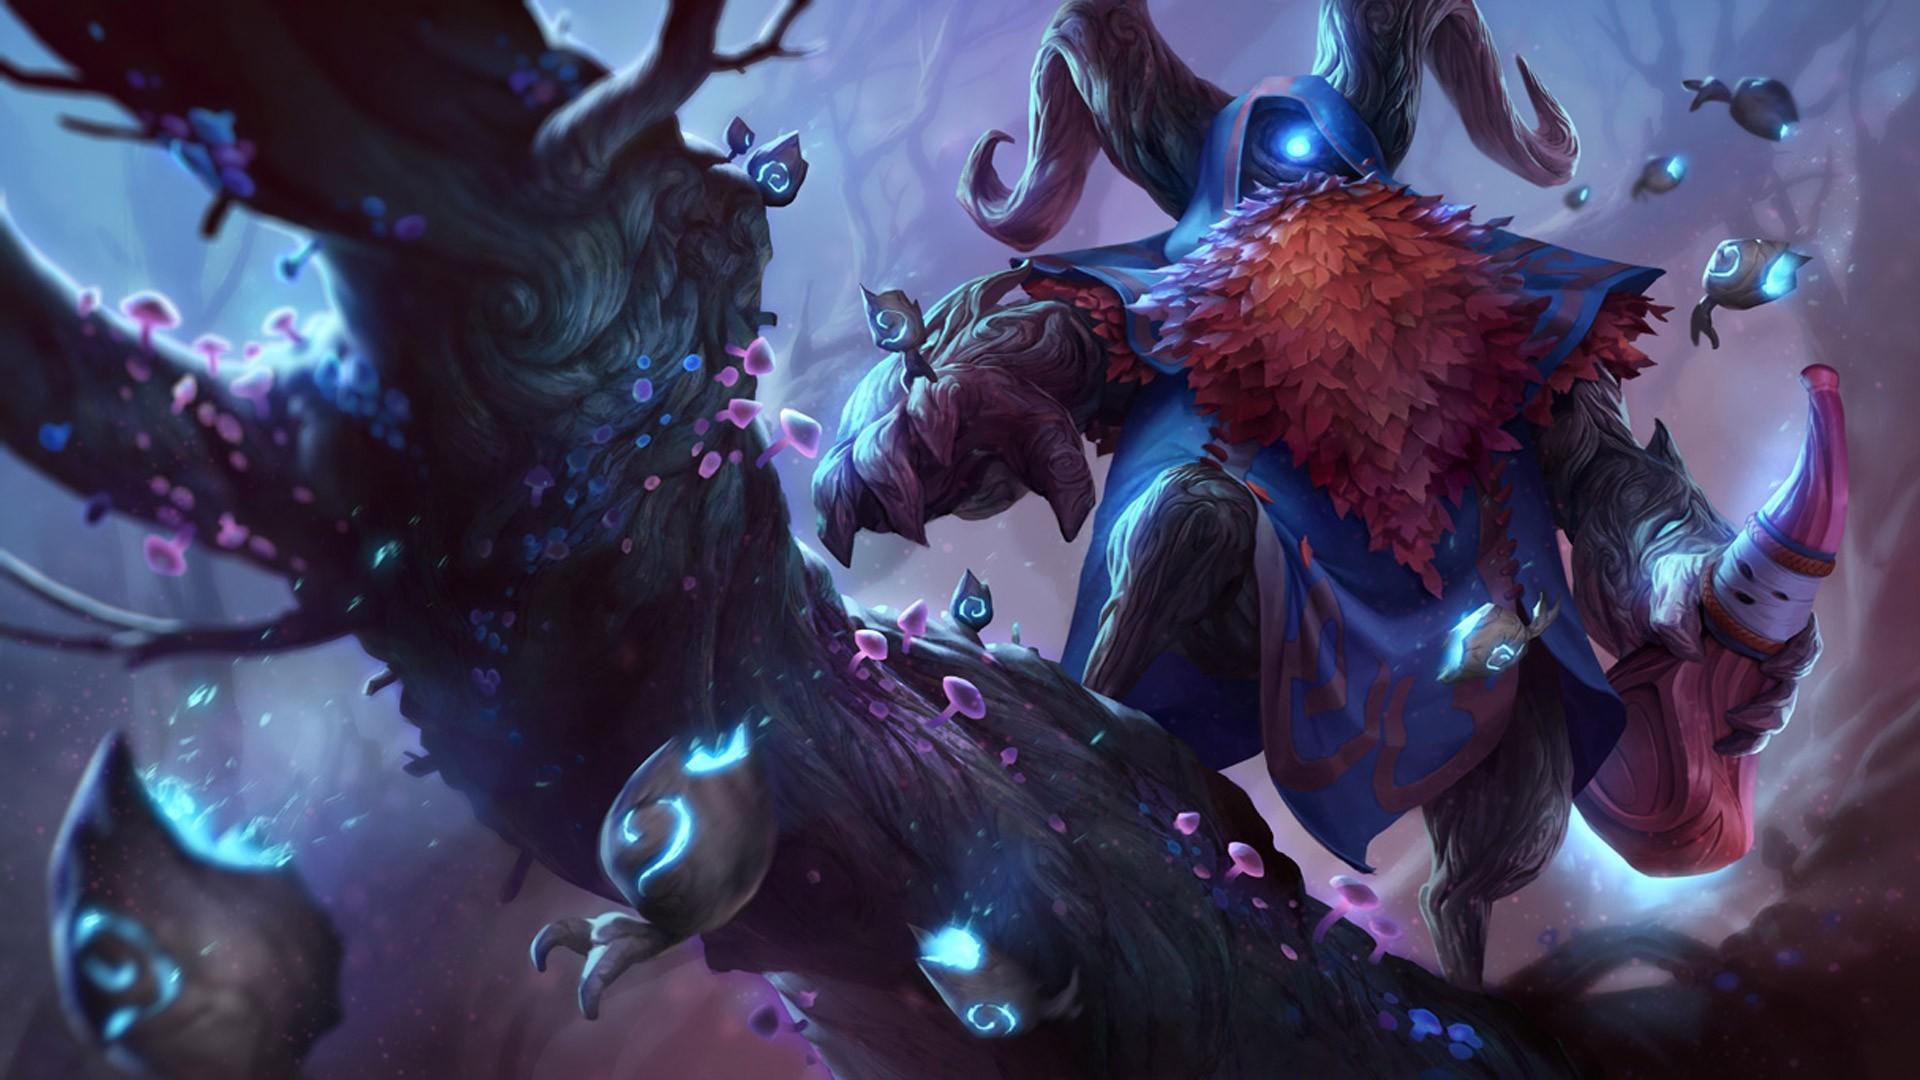 anime Summoner's Rift mythology Bard League of Legends Bardo screenshot  computer wallpaper fictional character special effects